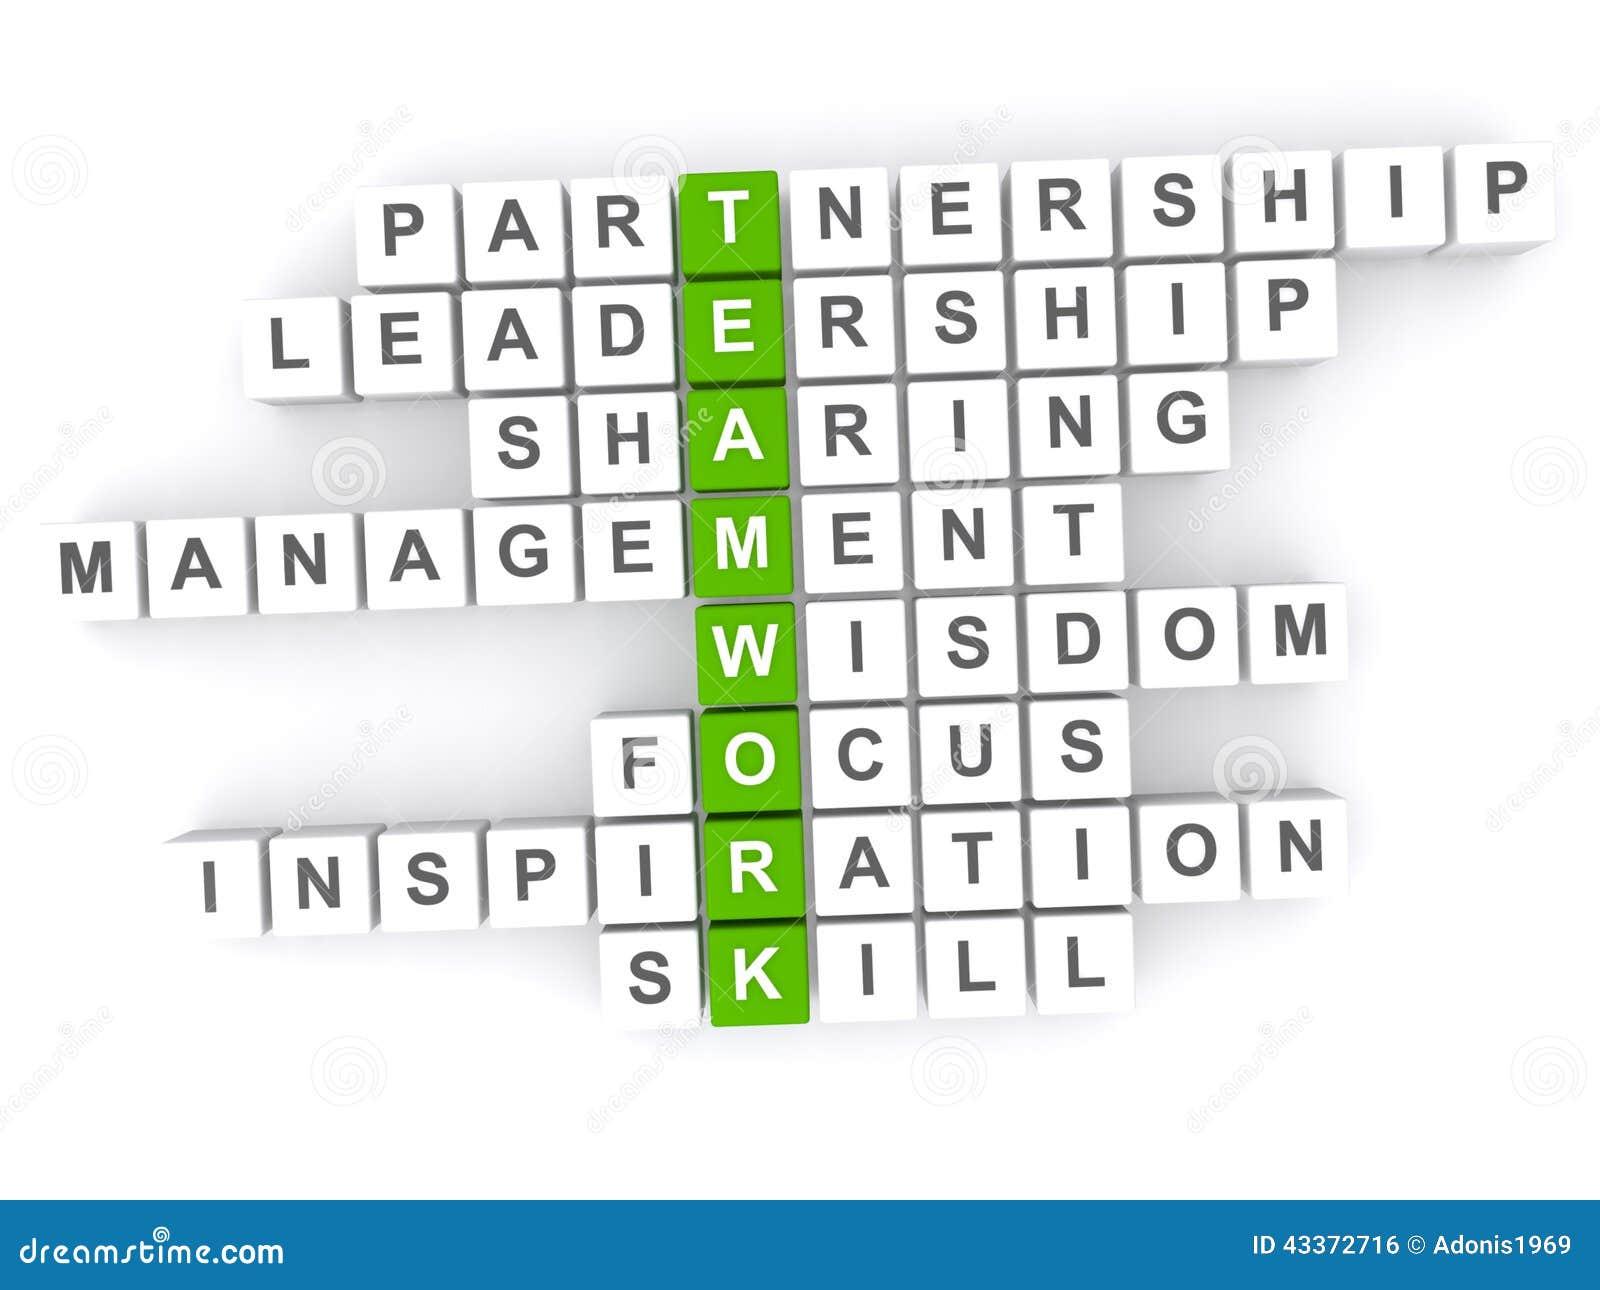 Teamwork Stock Illustration - Image: 43372716